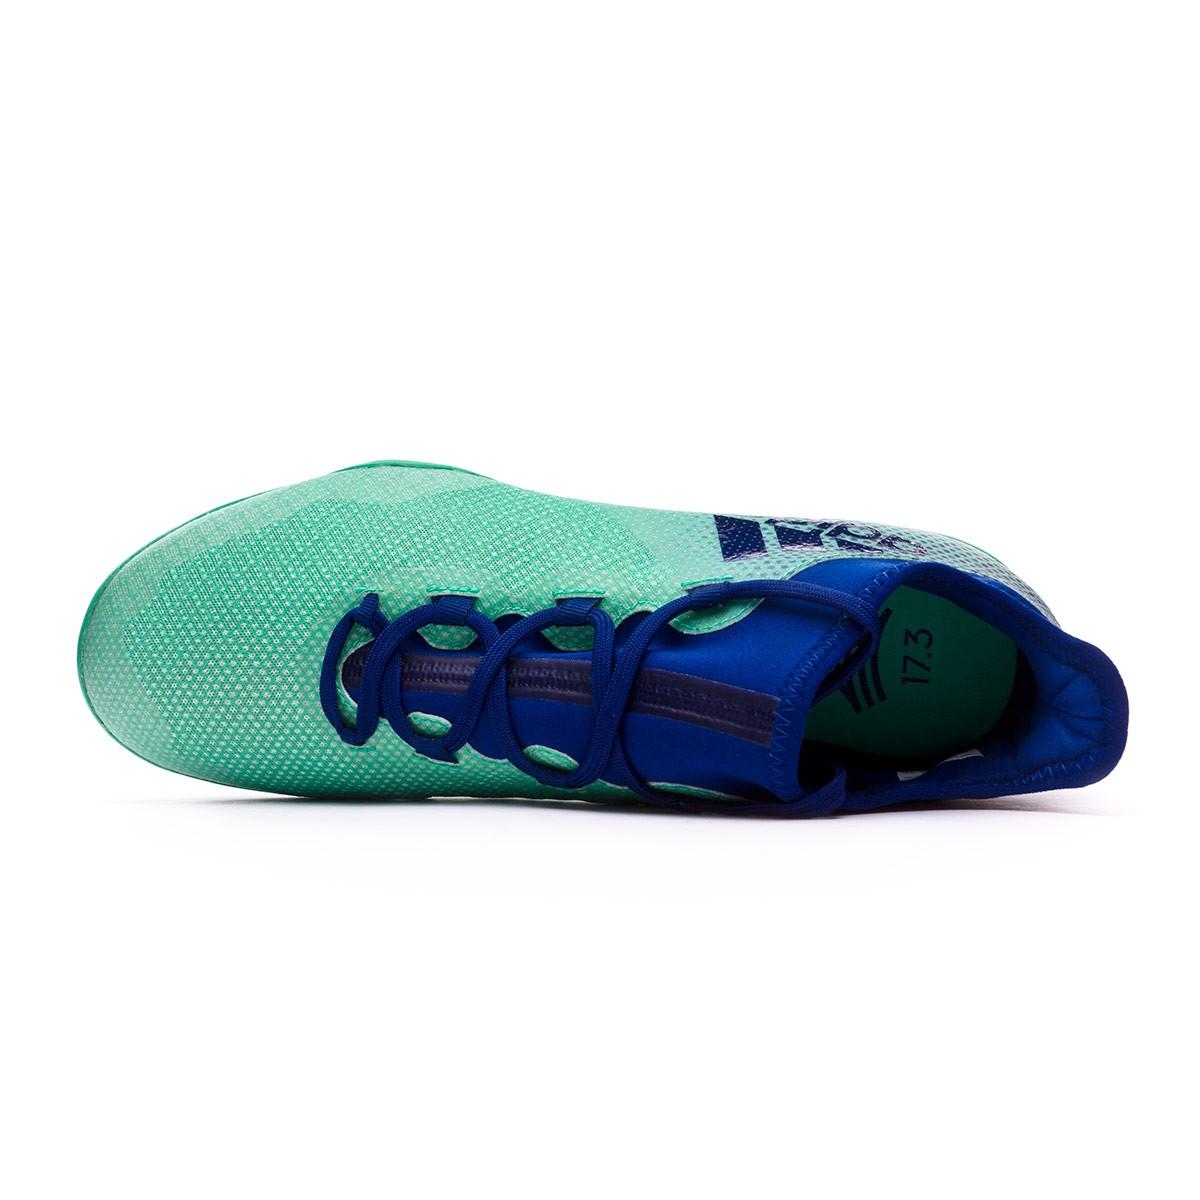 eeb64bc1a Futsal Boot adidas X Tango 17.3 IN Aero green-Unity ink-Hi-res green -  Football store Fútbol Emotion